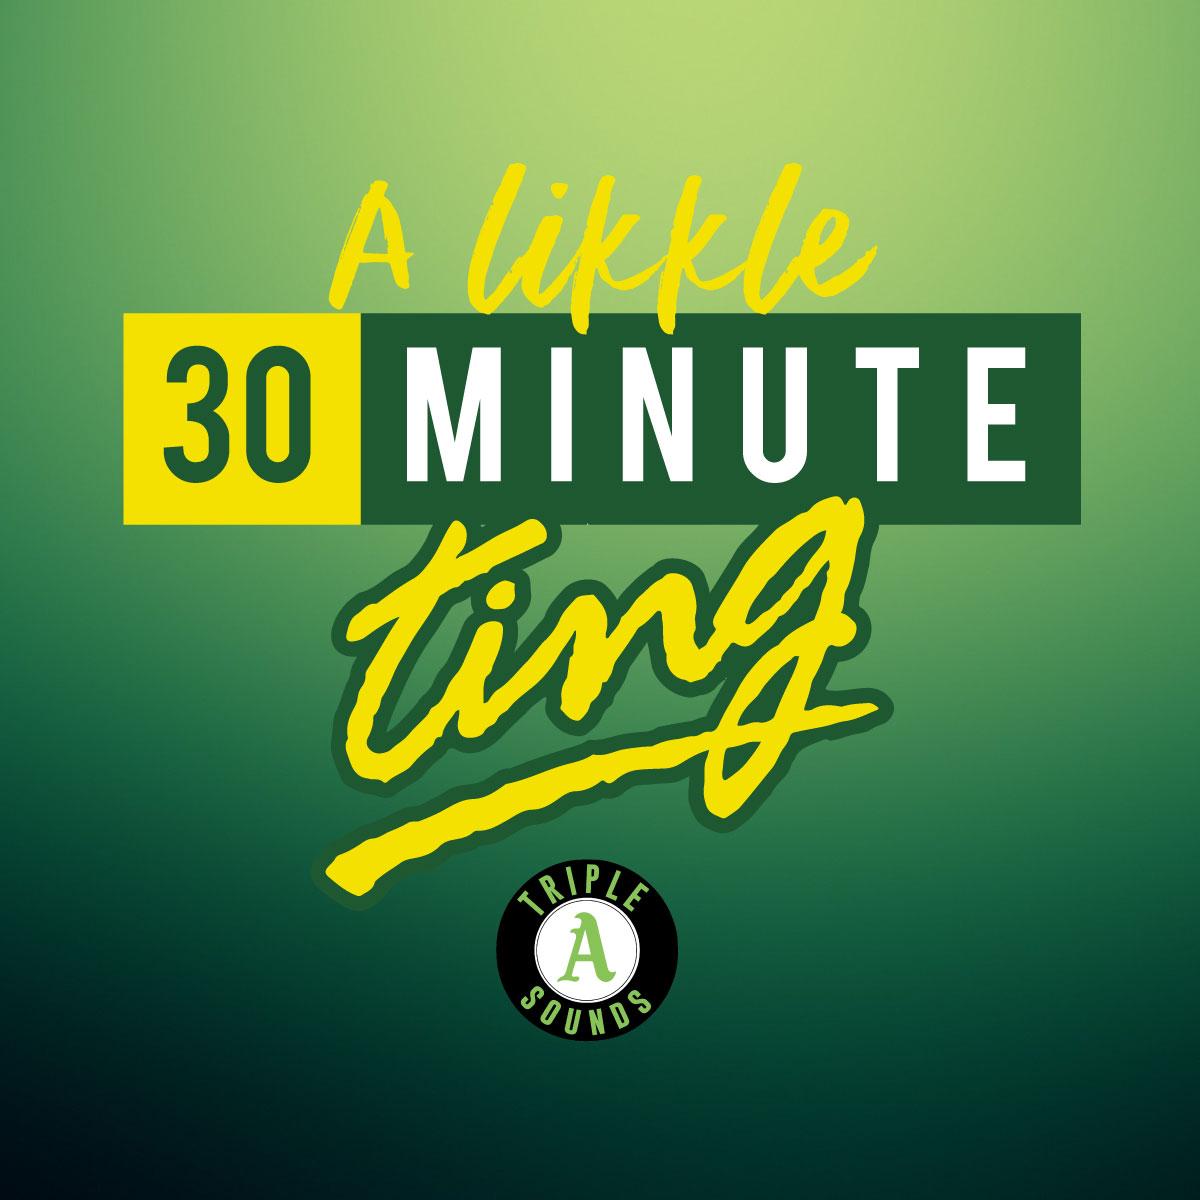 A-likkle-30-min-ting.jpg